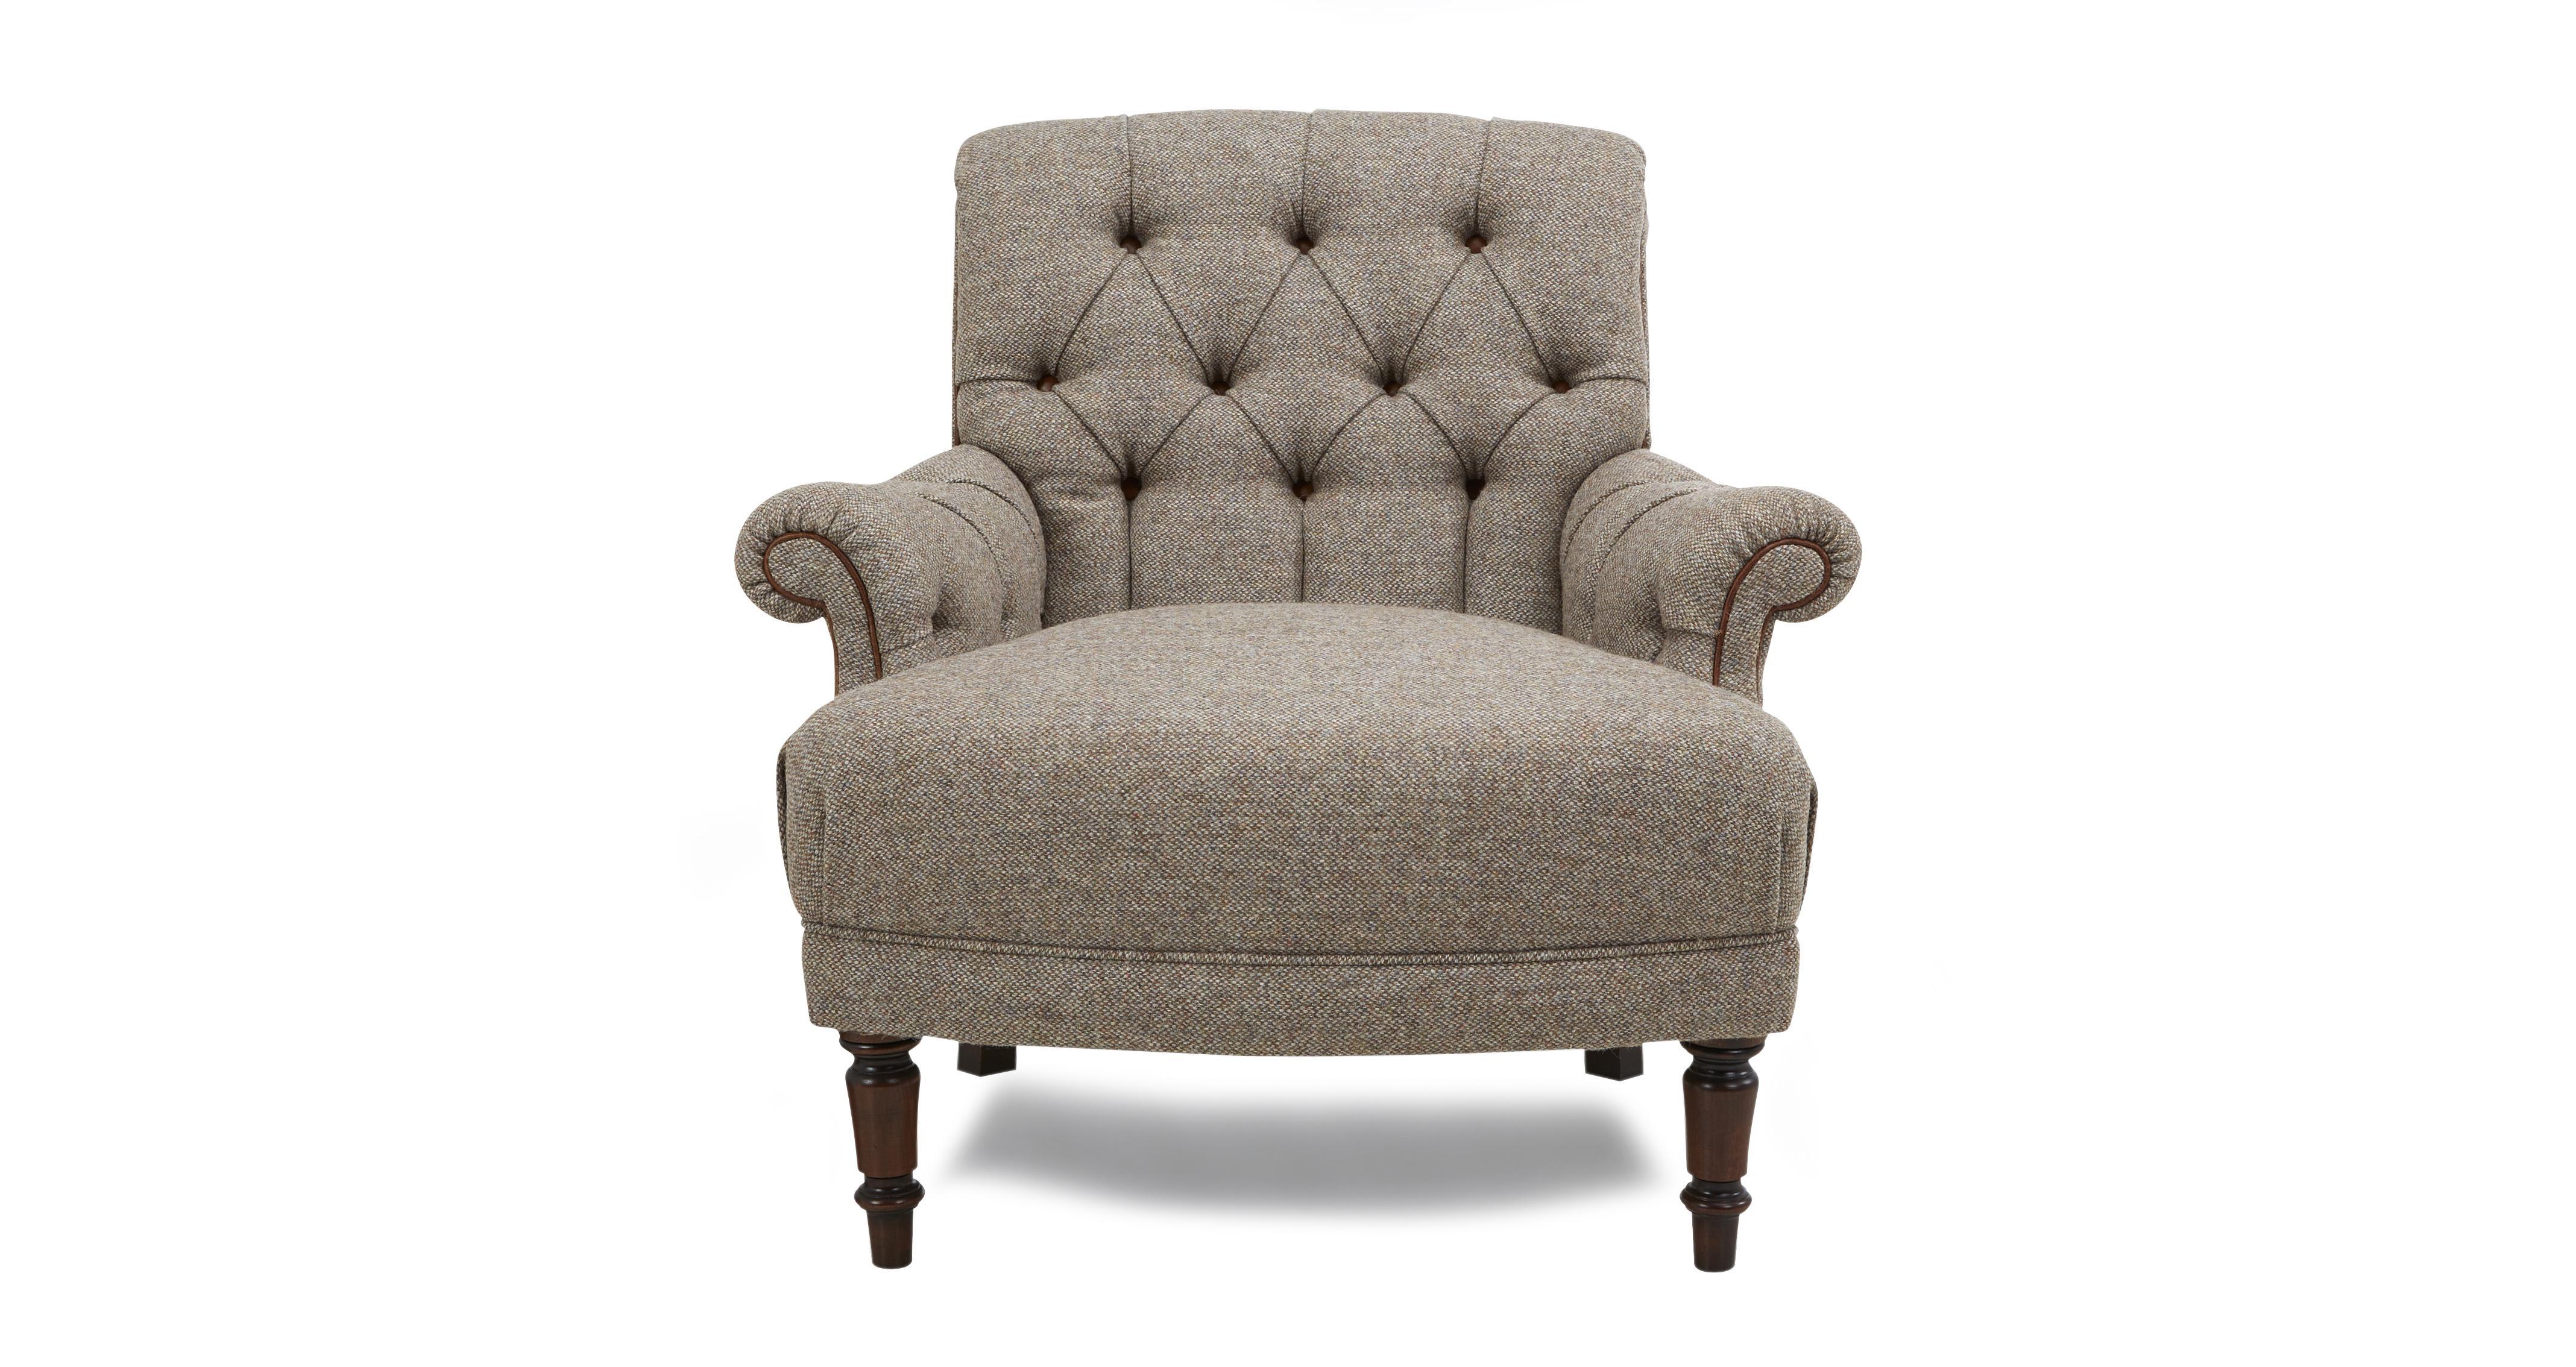 Kintyre Accent Chair Harris Tweed